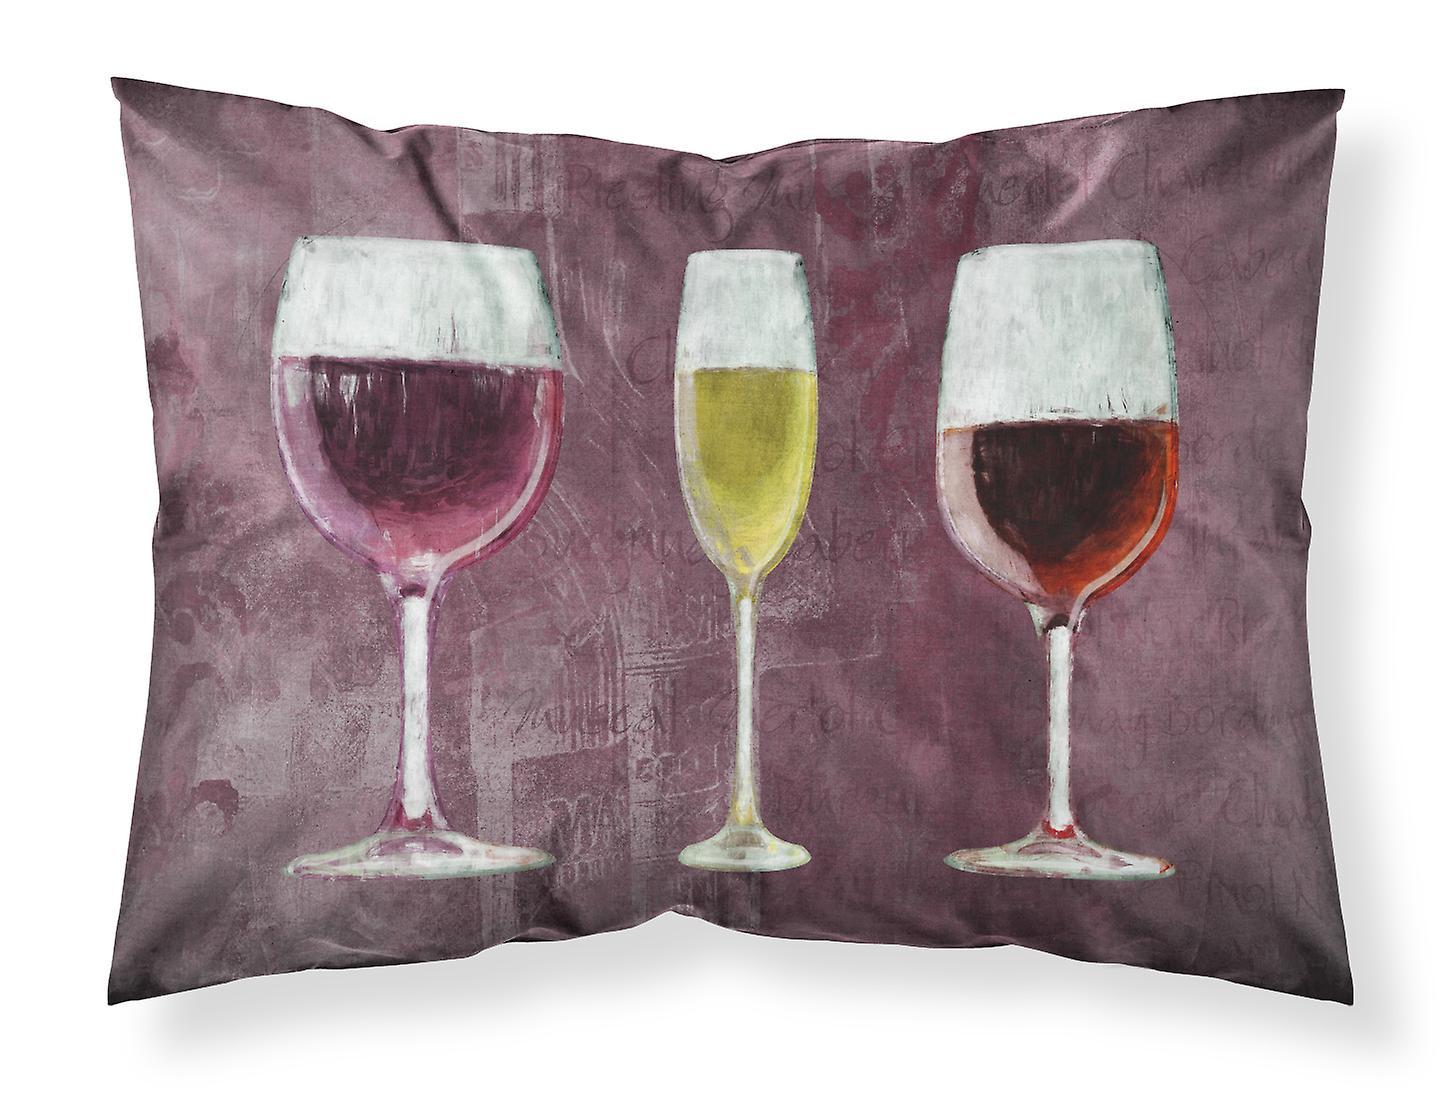 De Wicking Pourpre Humidité Verres Tissu Vin Standard Trois Taie D'oreiller Xwk0O8nP